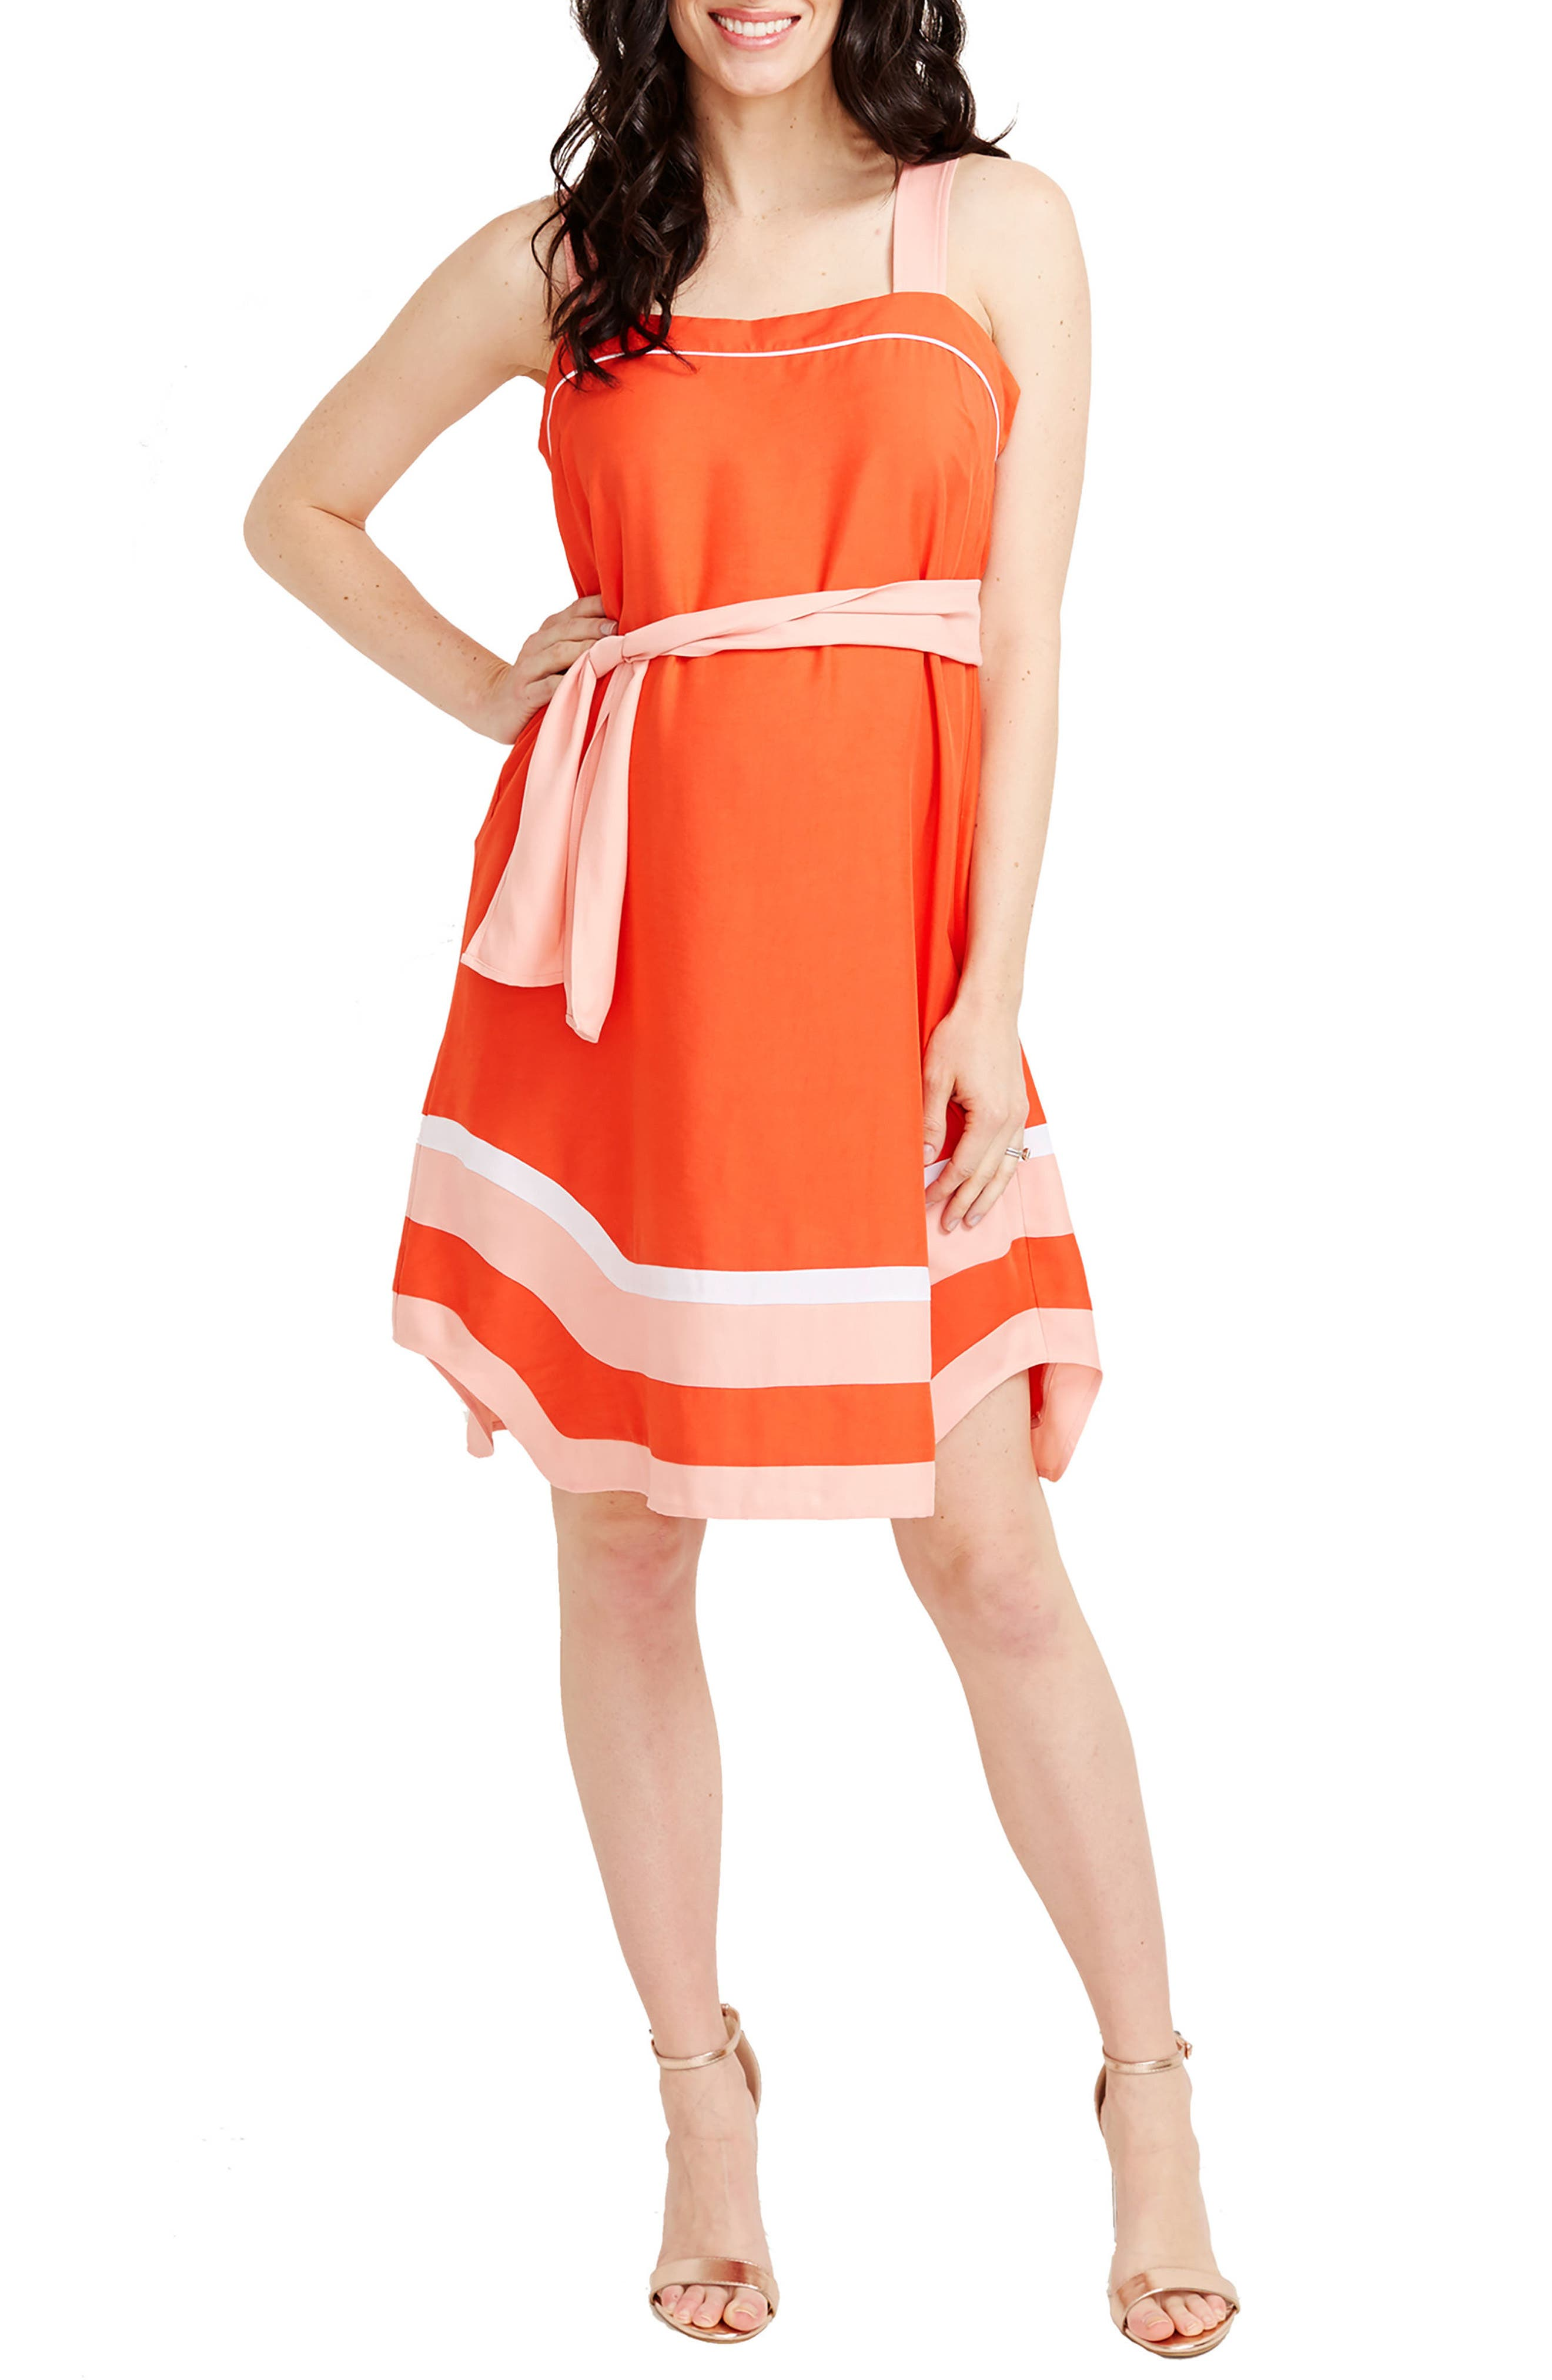 Rosie Pope Delfina Maternity Dress, Orange